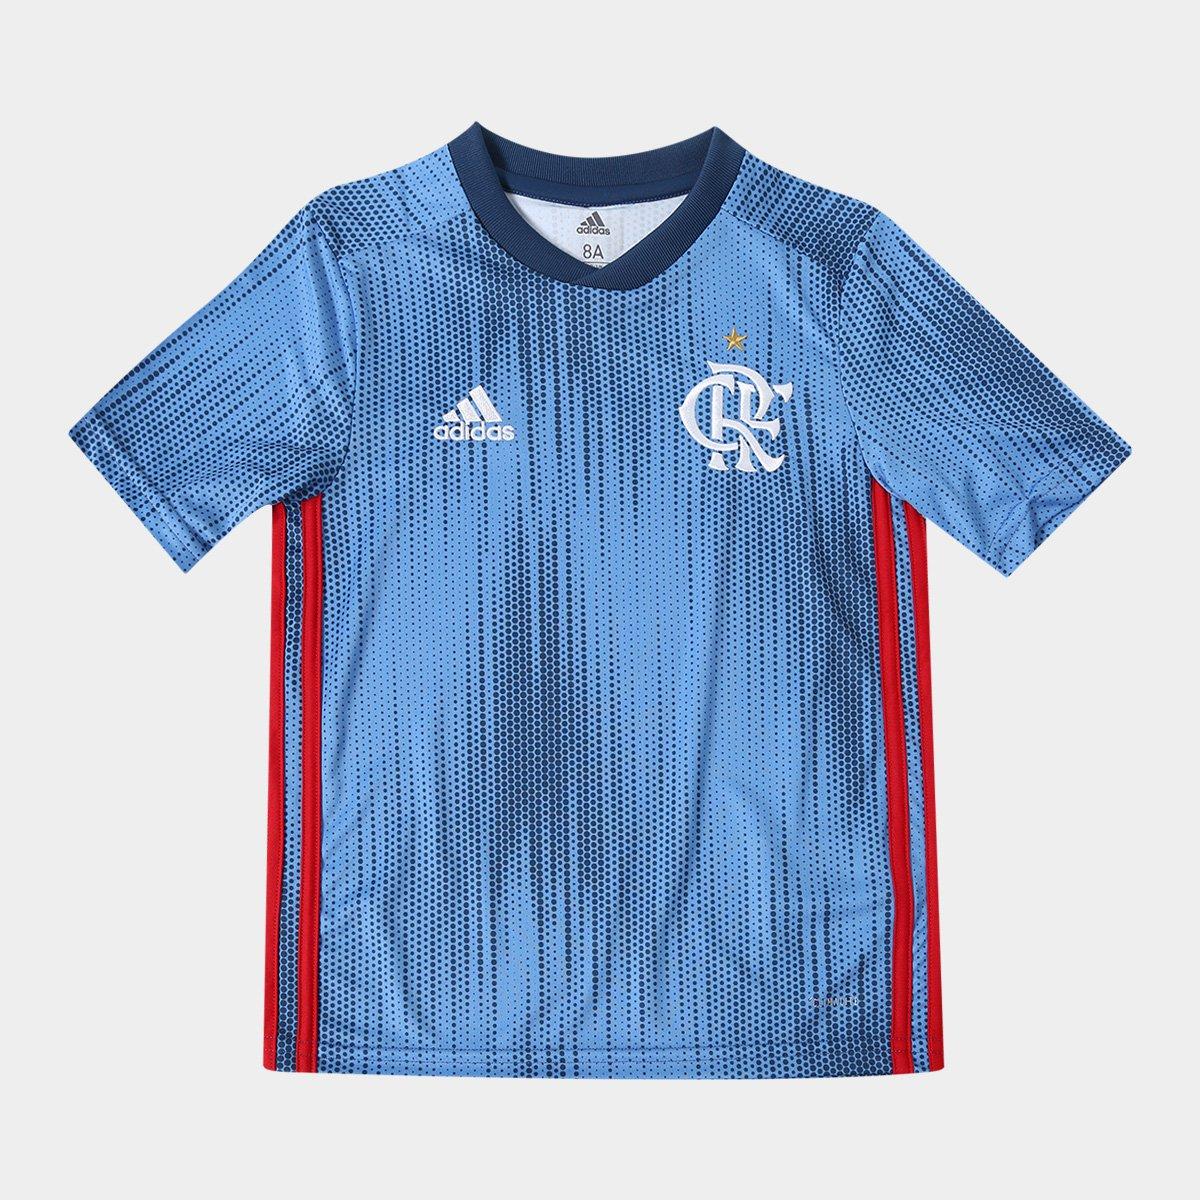 Camisa Infantil Flamengo III 2018 s n° - Torcedor Adidas - Compre Agora  10bfab4c276